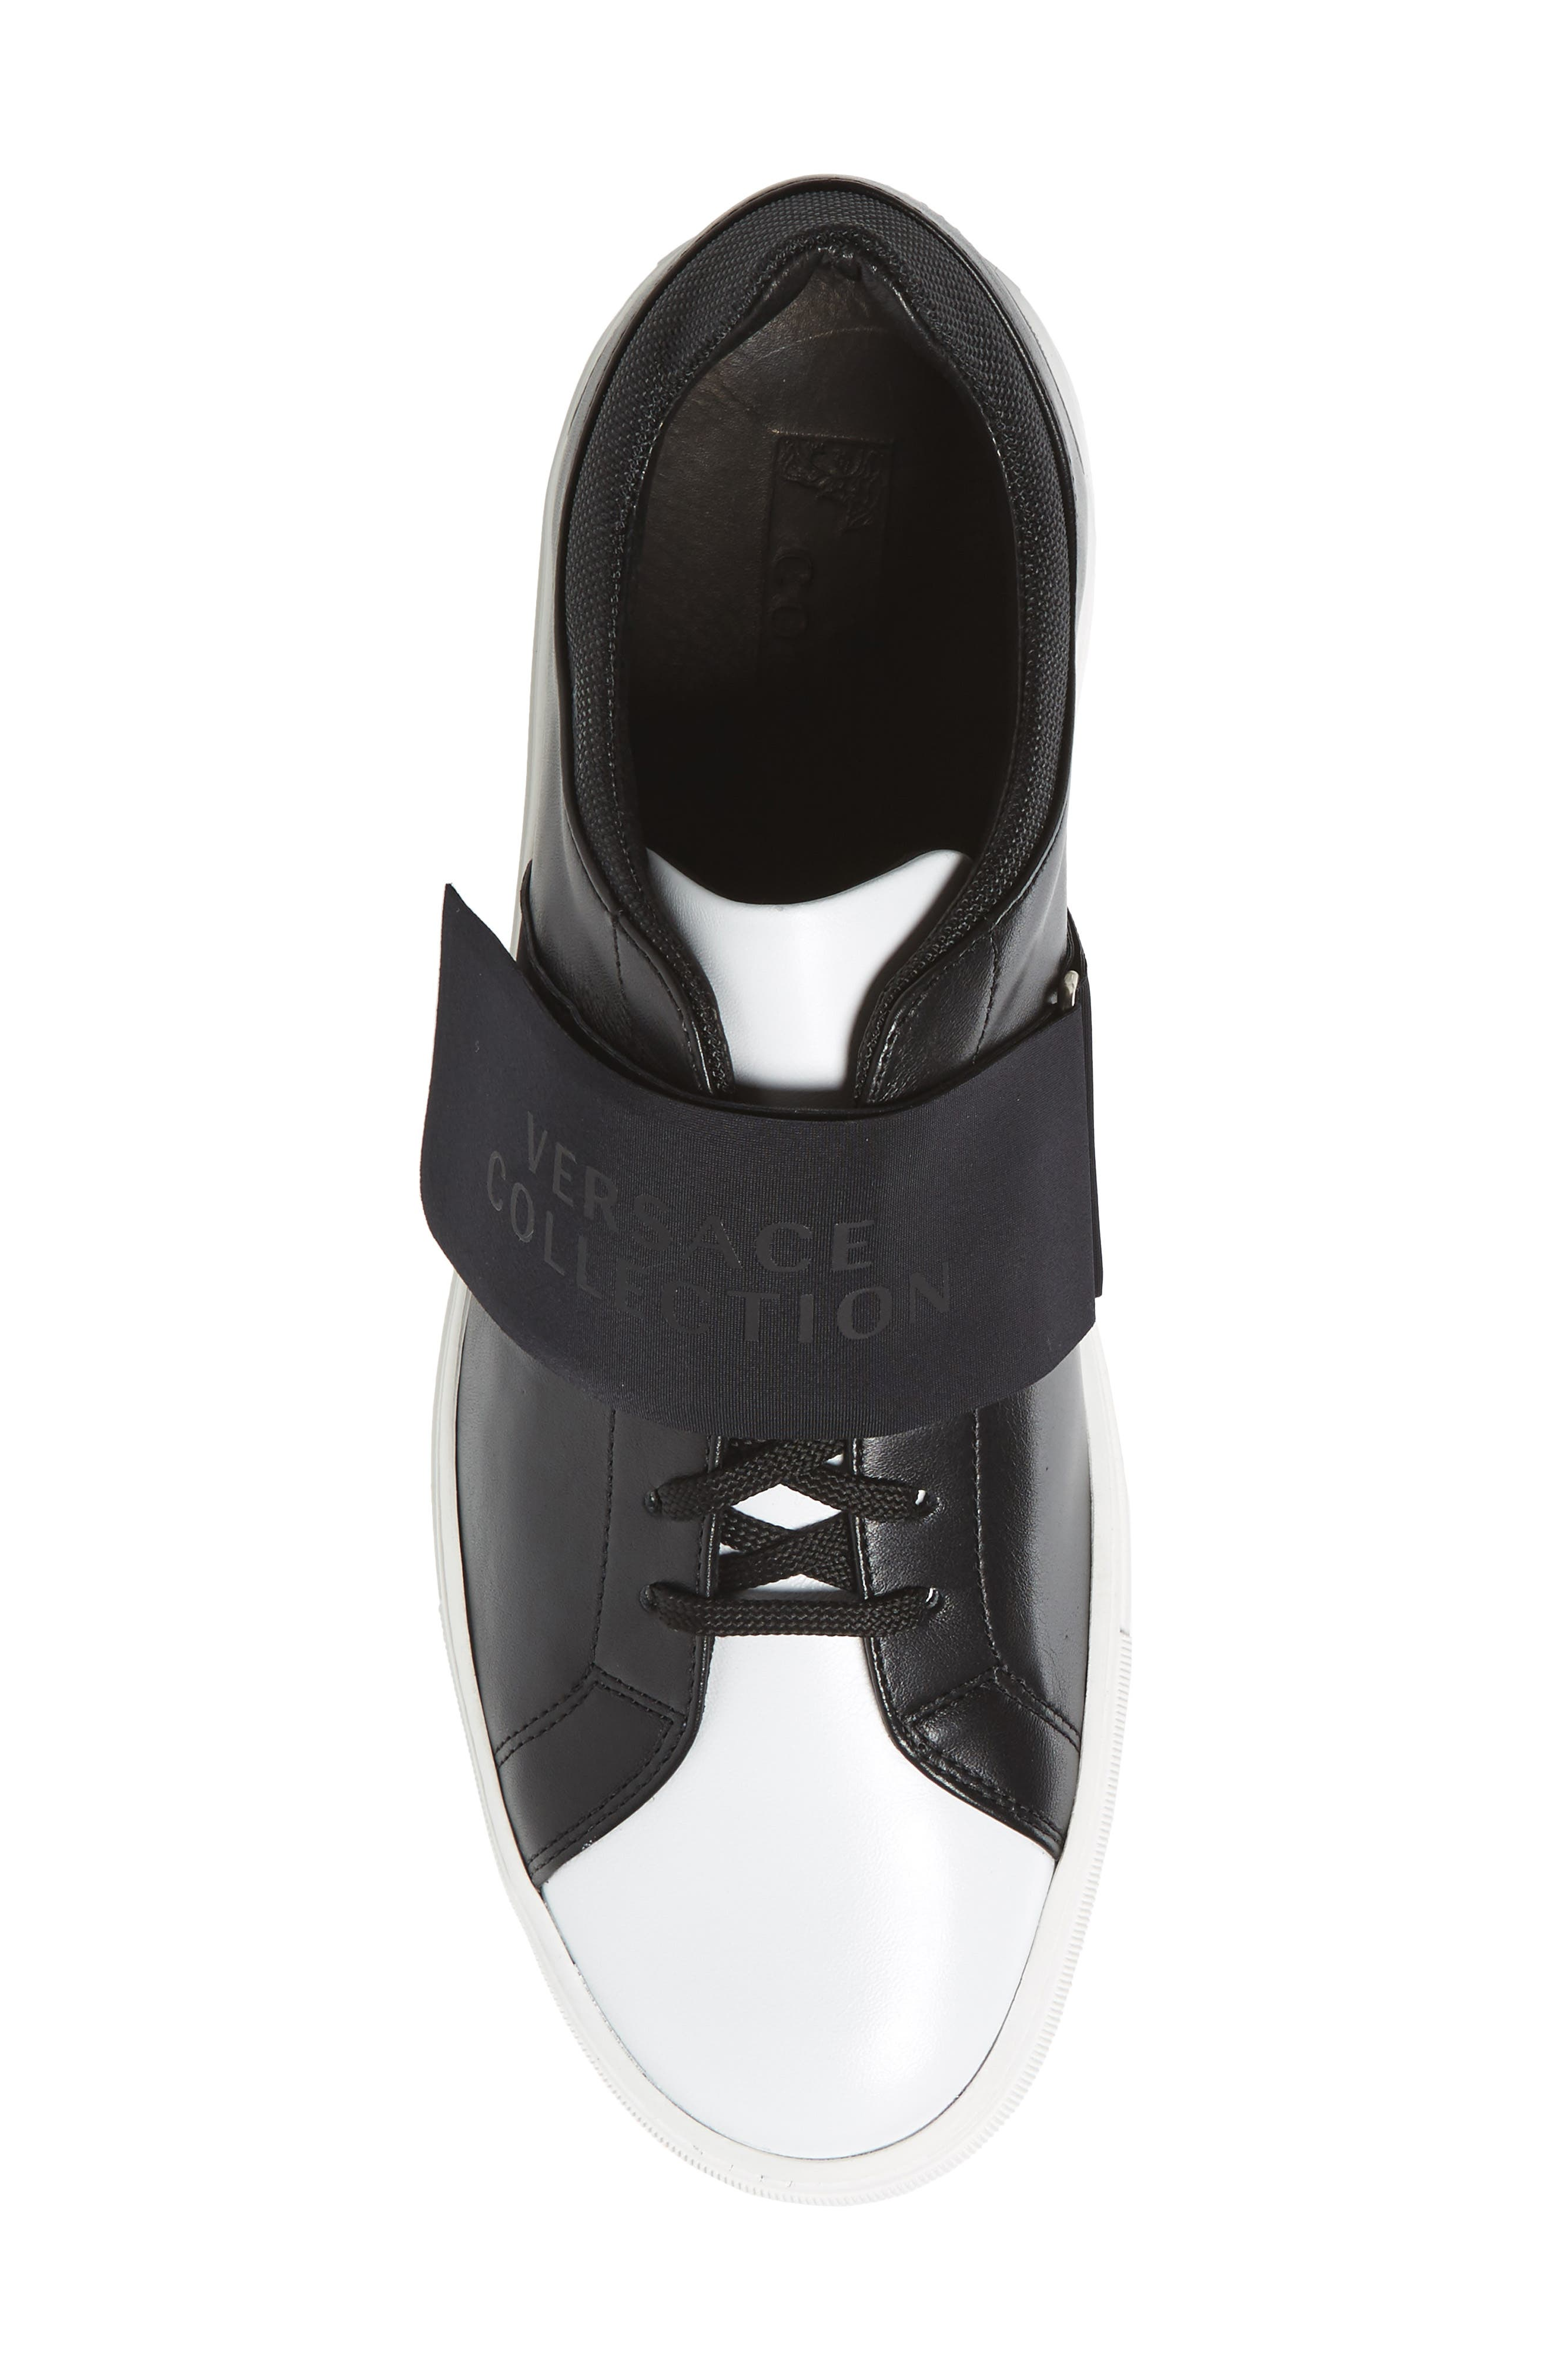 Strap Sneaker,                             Alternate thumbnail 5, color,                             Bianco/ Nero Leather